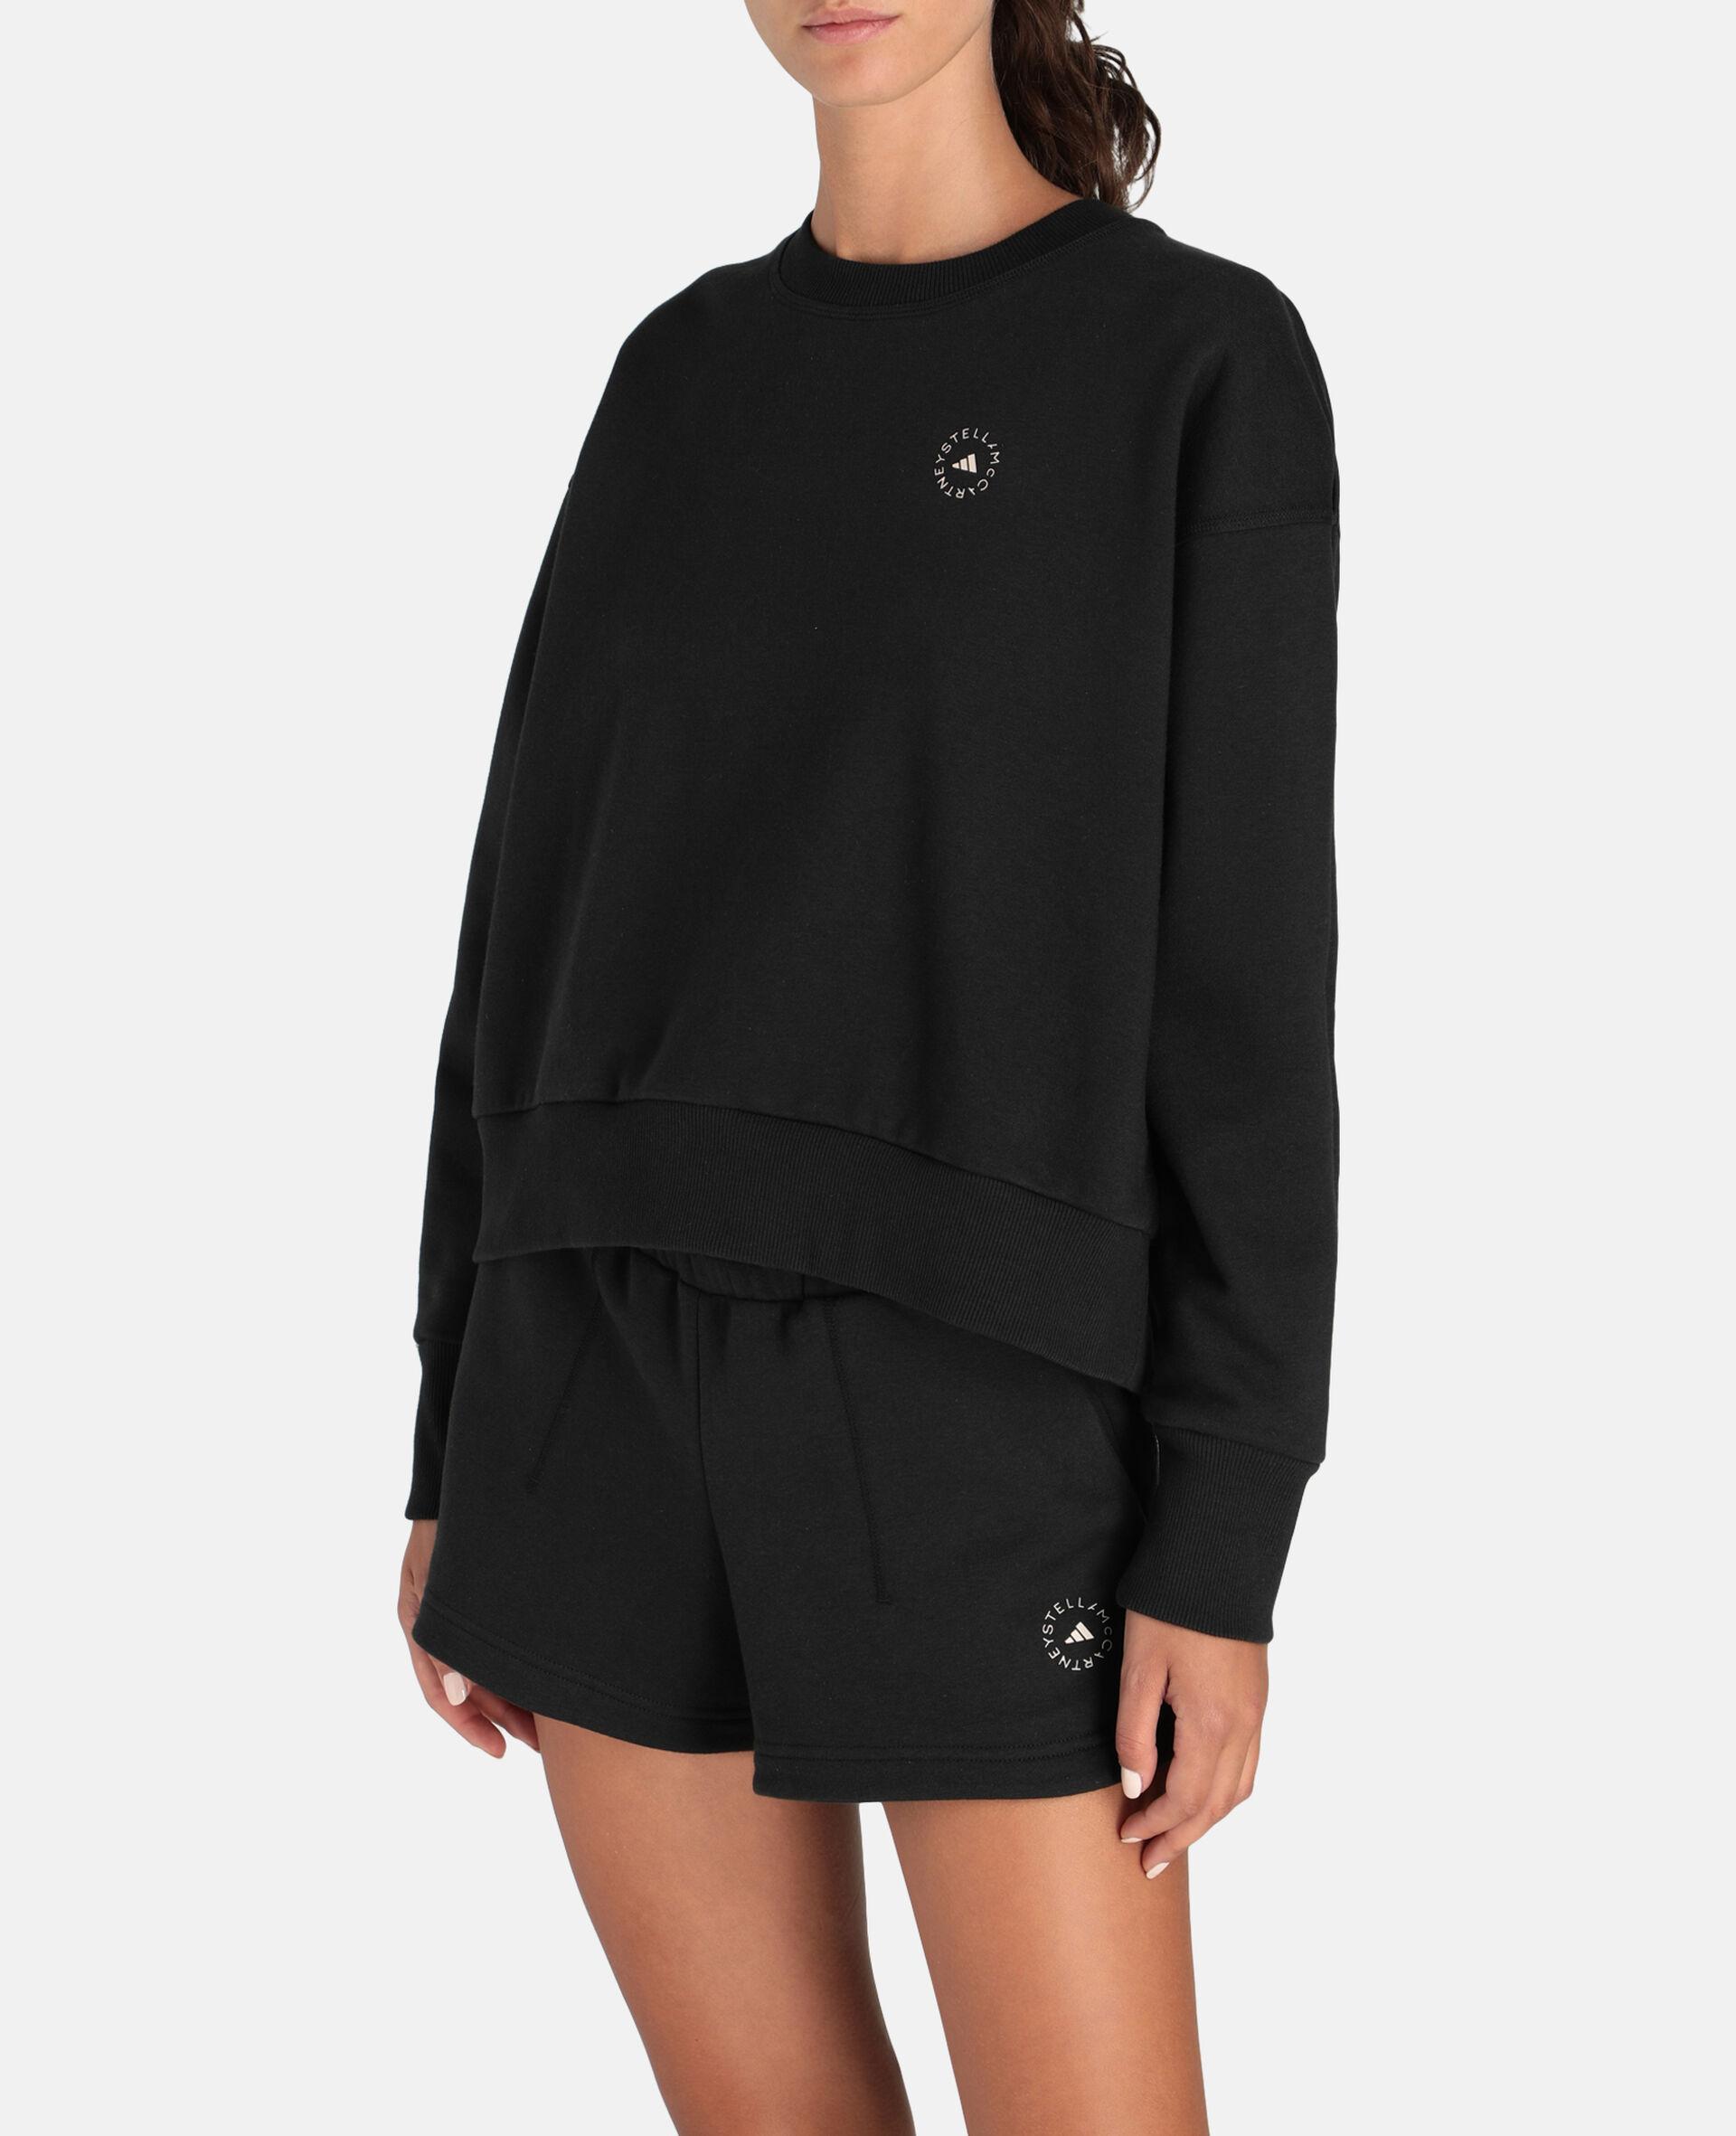 Black Training Sweatshirt-Black-large image number 4